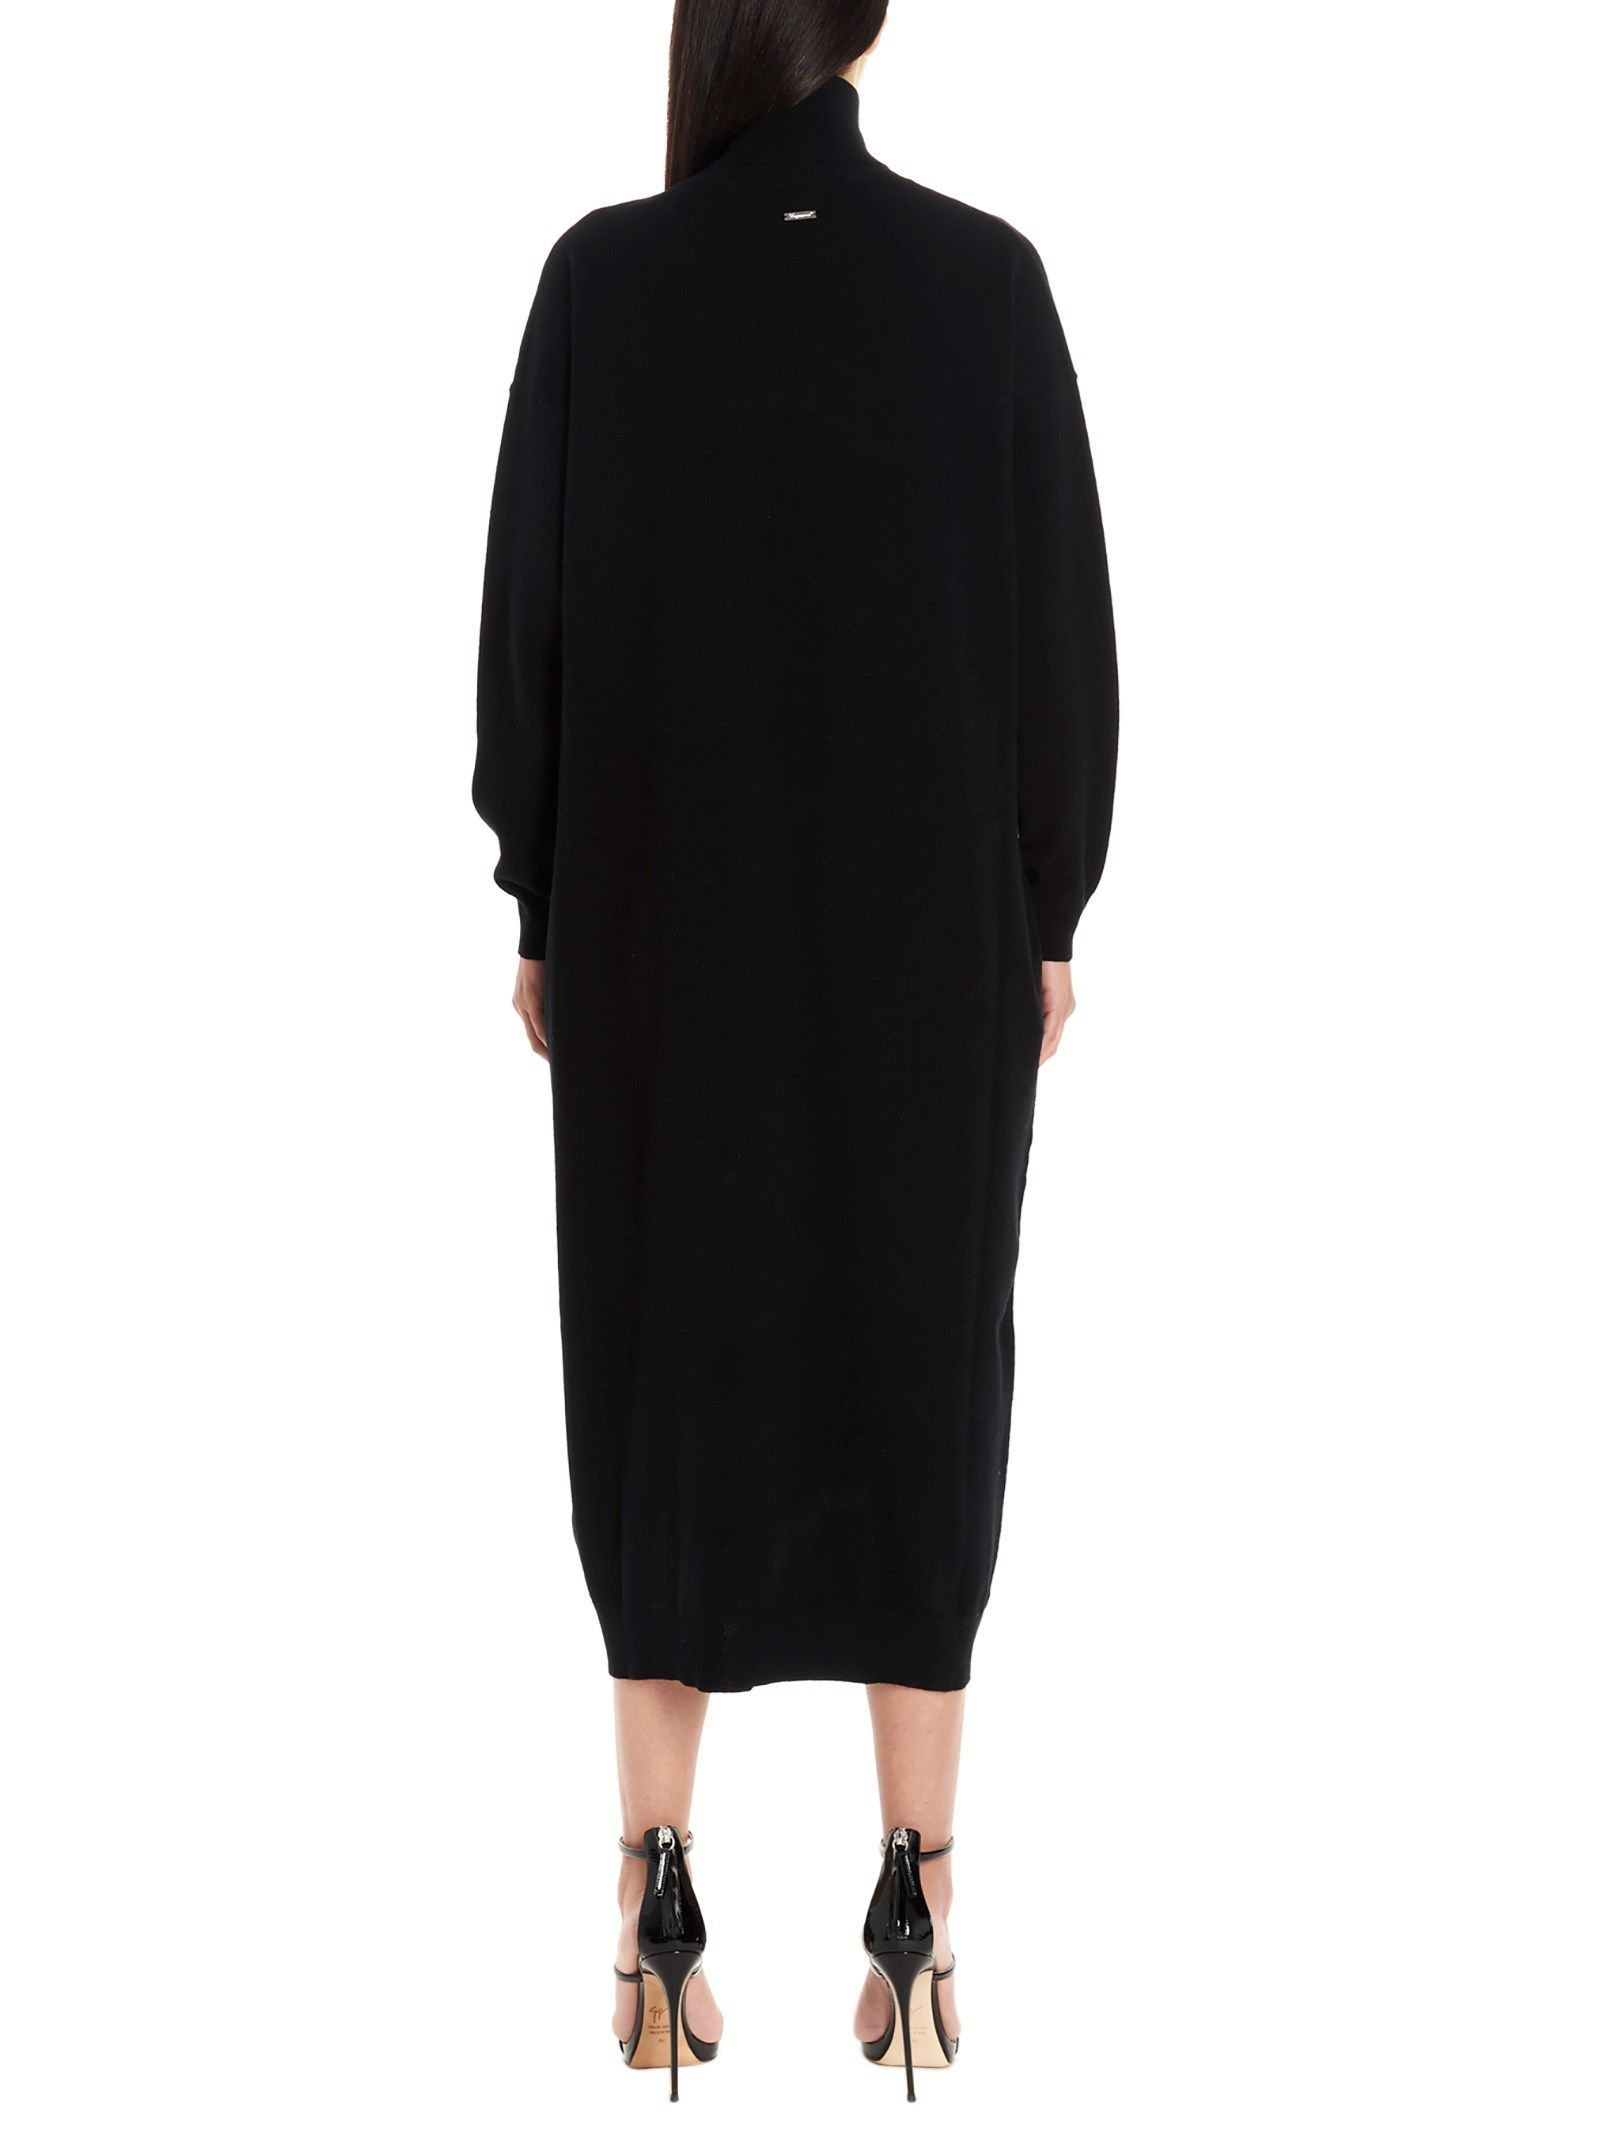 DSQUARED2 WOMEN'S S75CV0102S16894900 BLACK WOOL DRESS